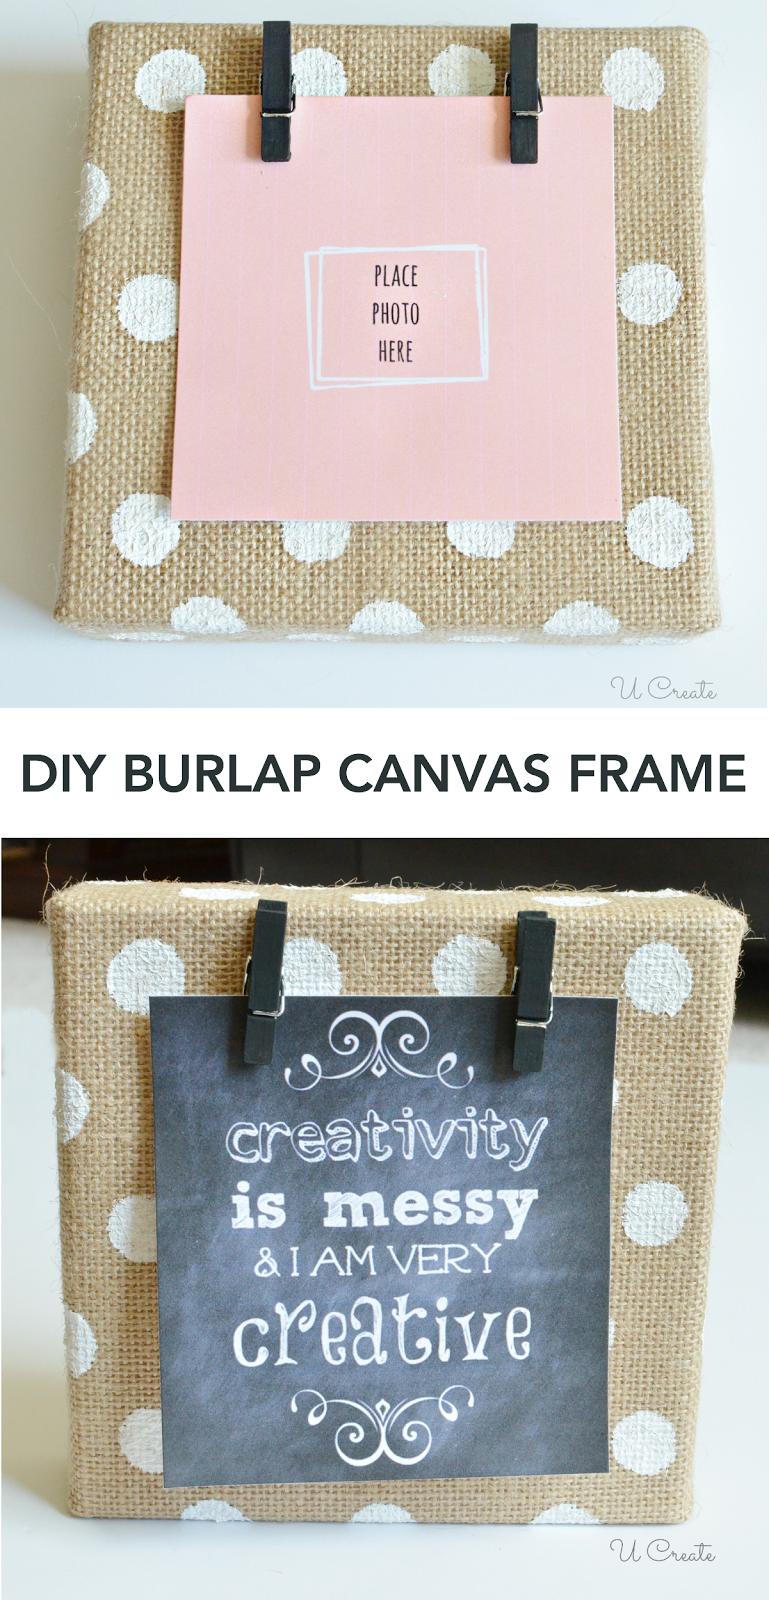 DIY Burlap Canvas Frame - with polkadots | DIY | Pinterest ...